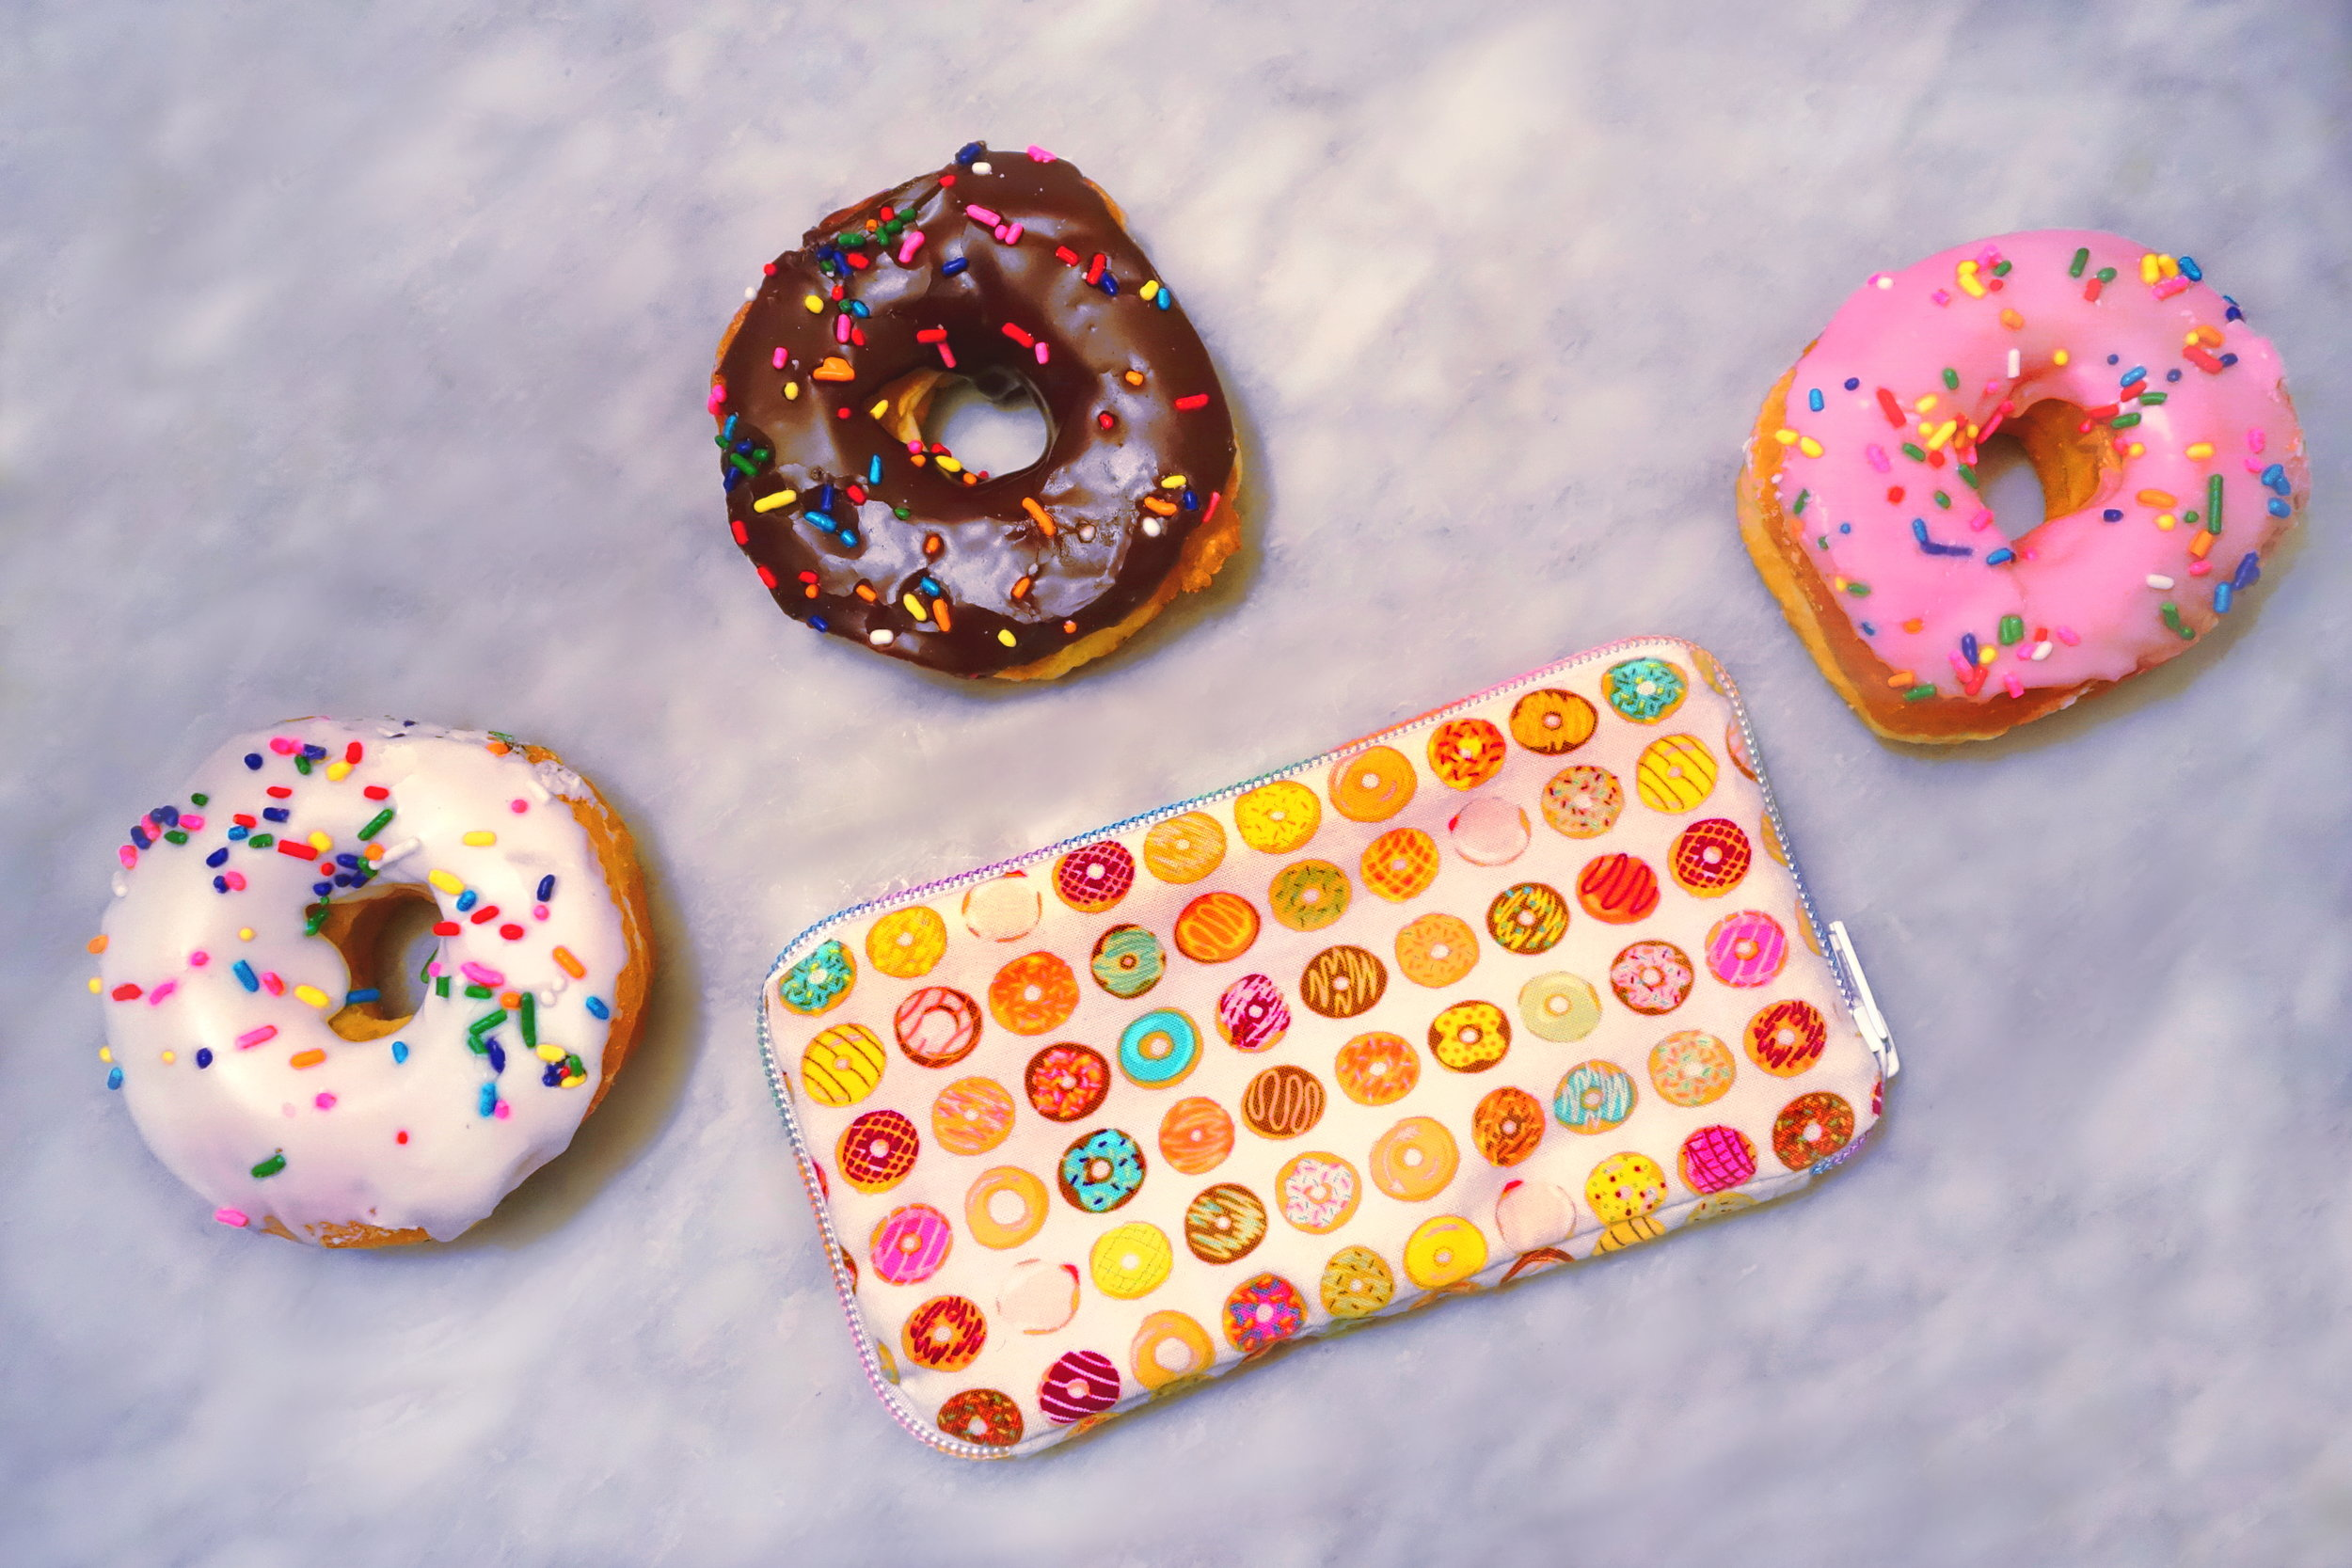 Handmade Donut Checkbook by BYMUN